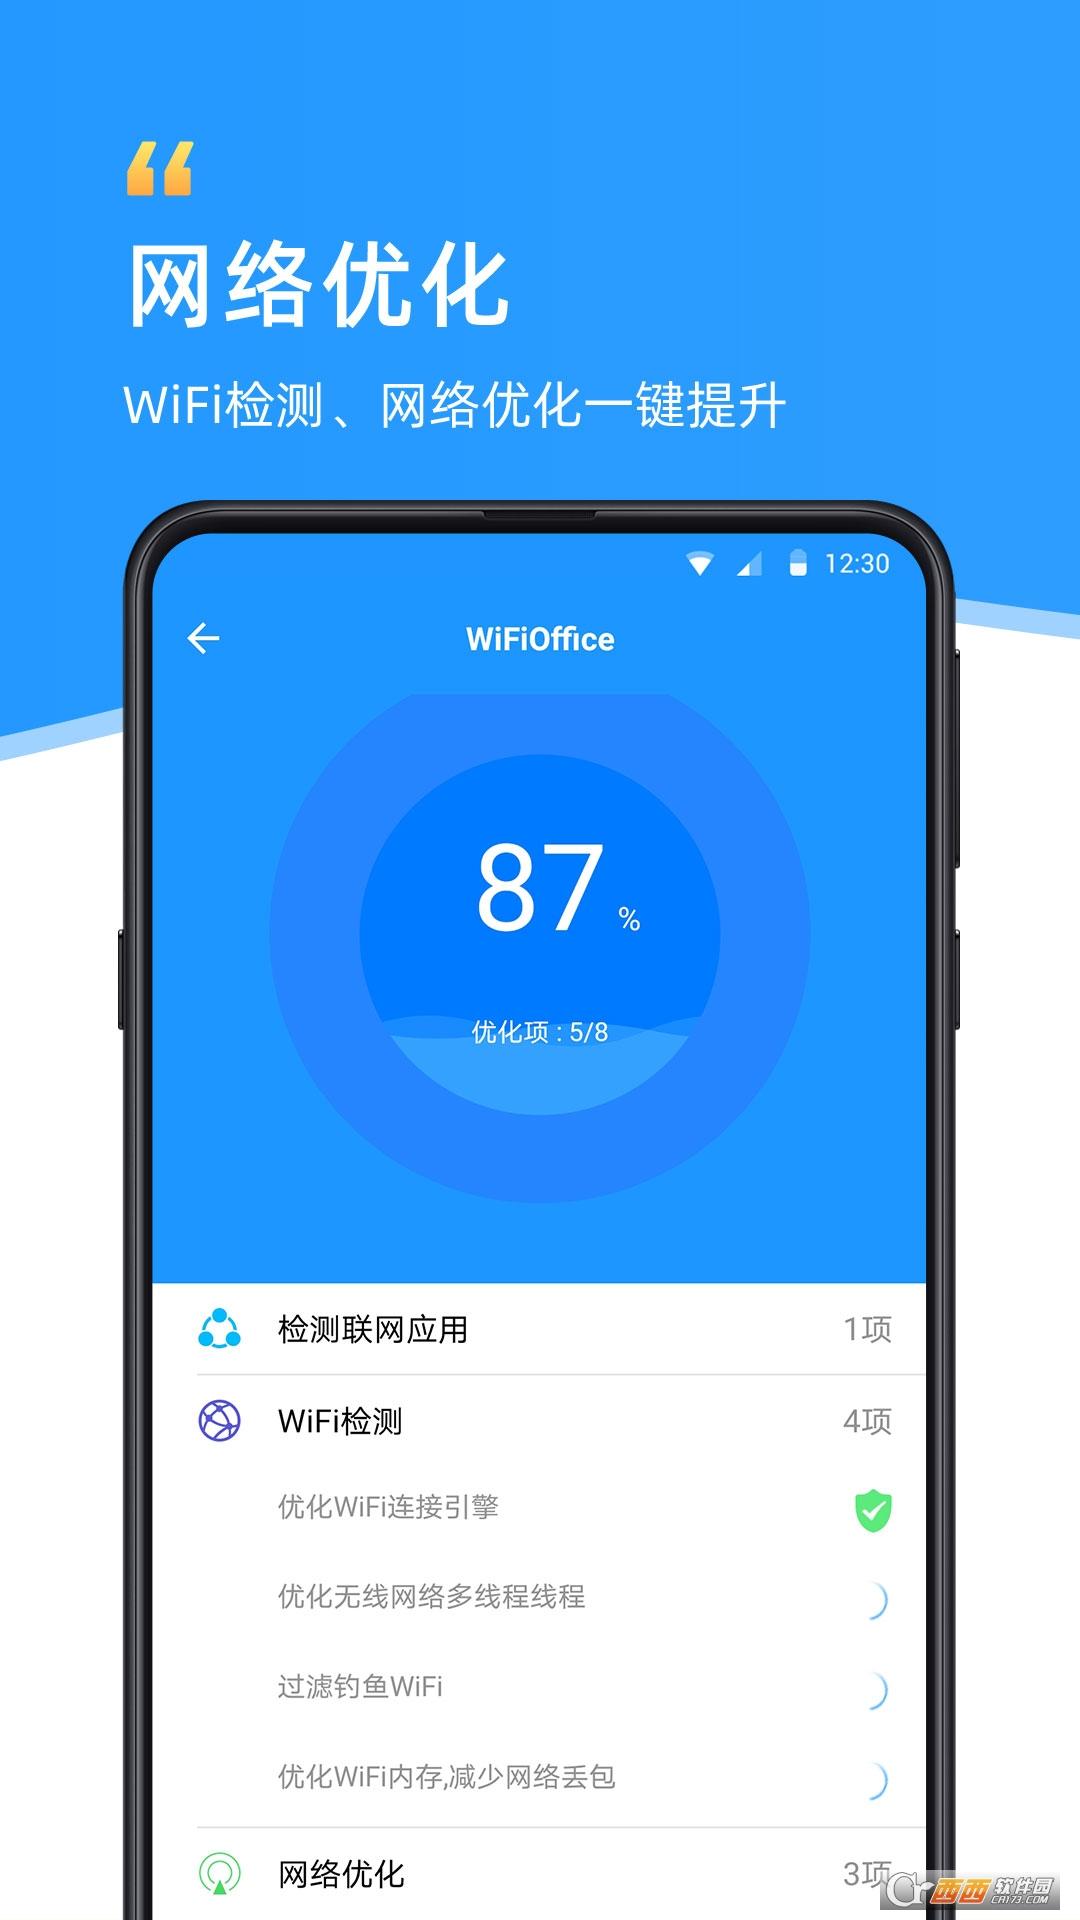 WiFi伴侣 5.9.1 官方最新版